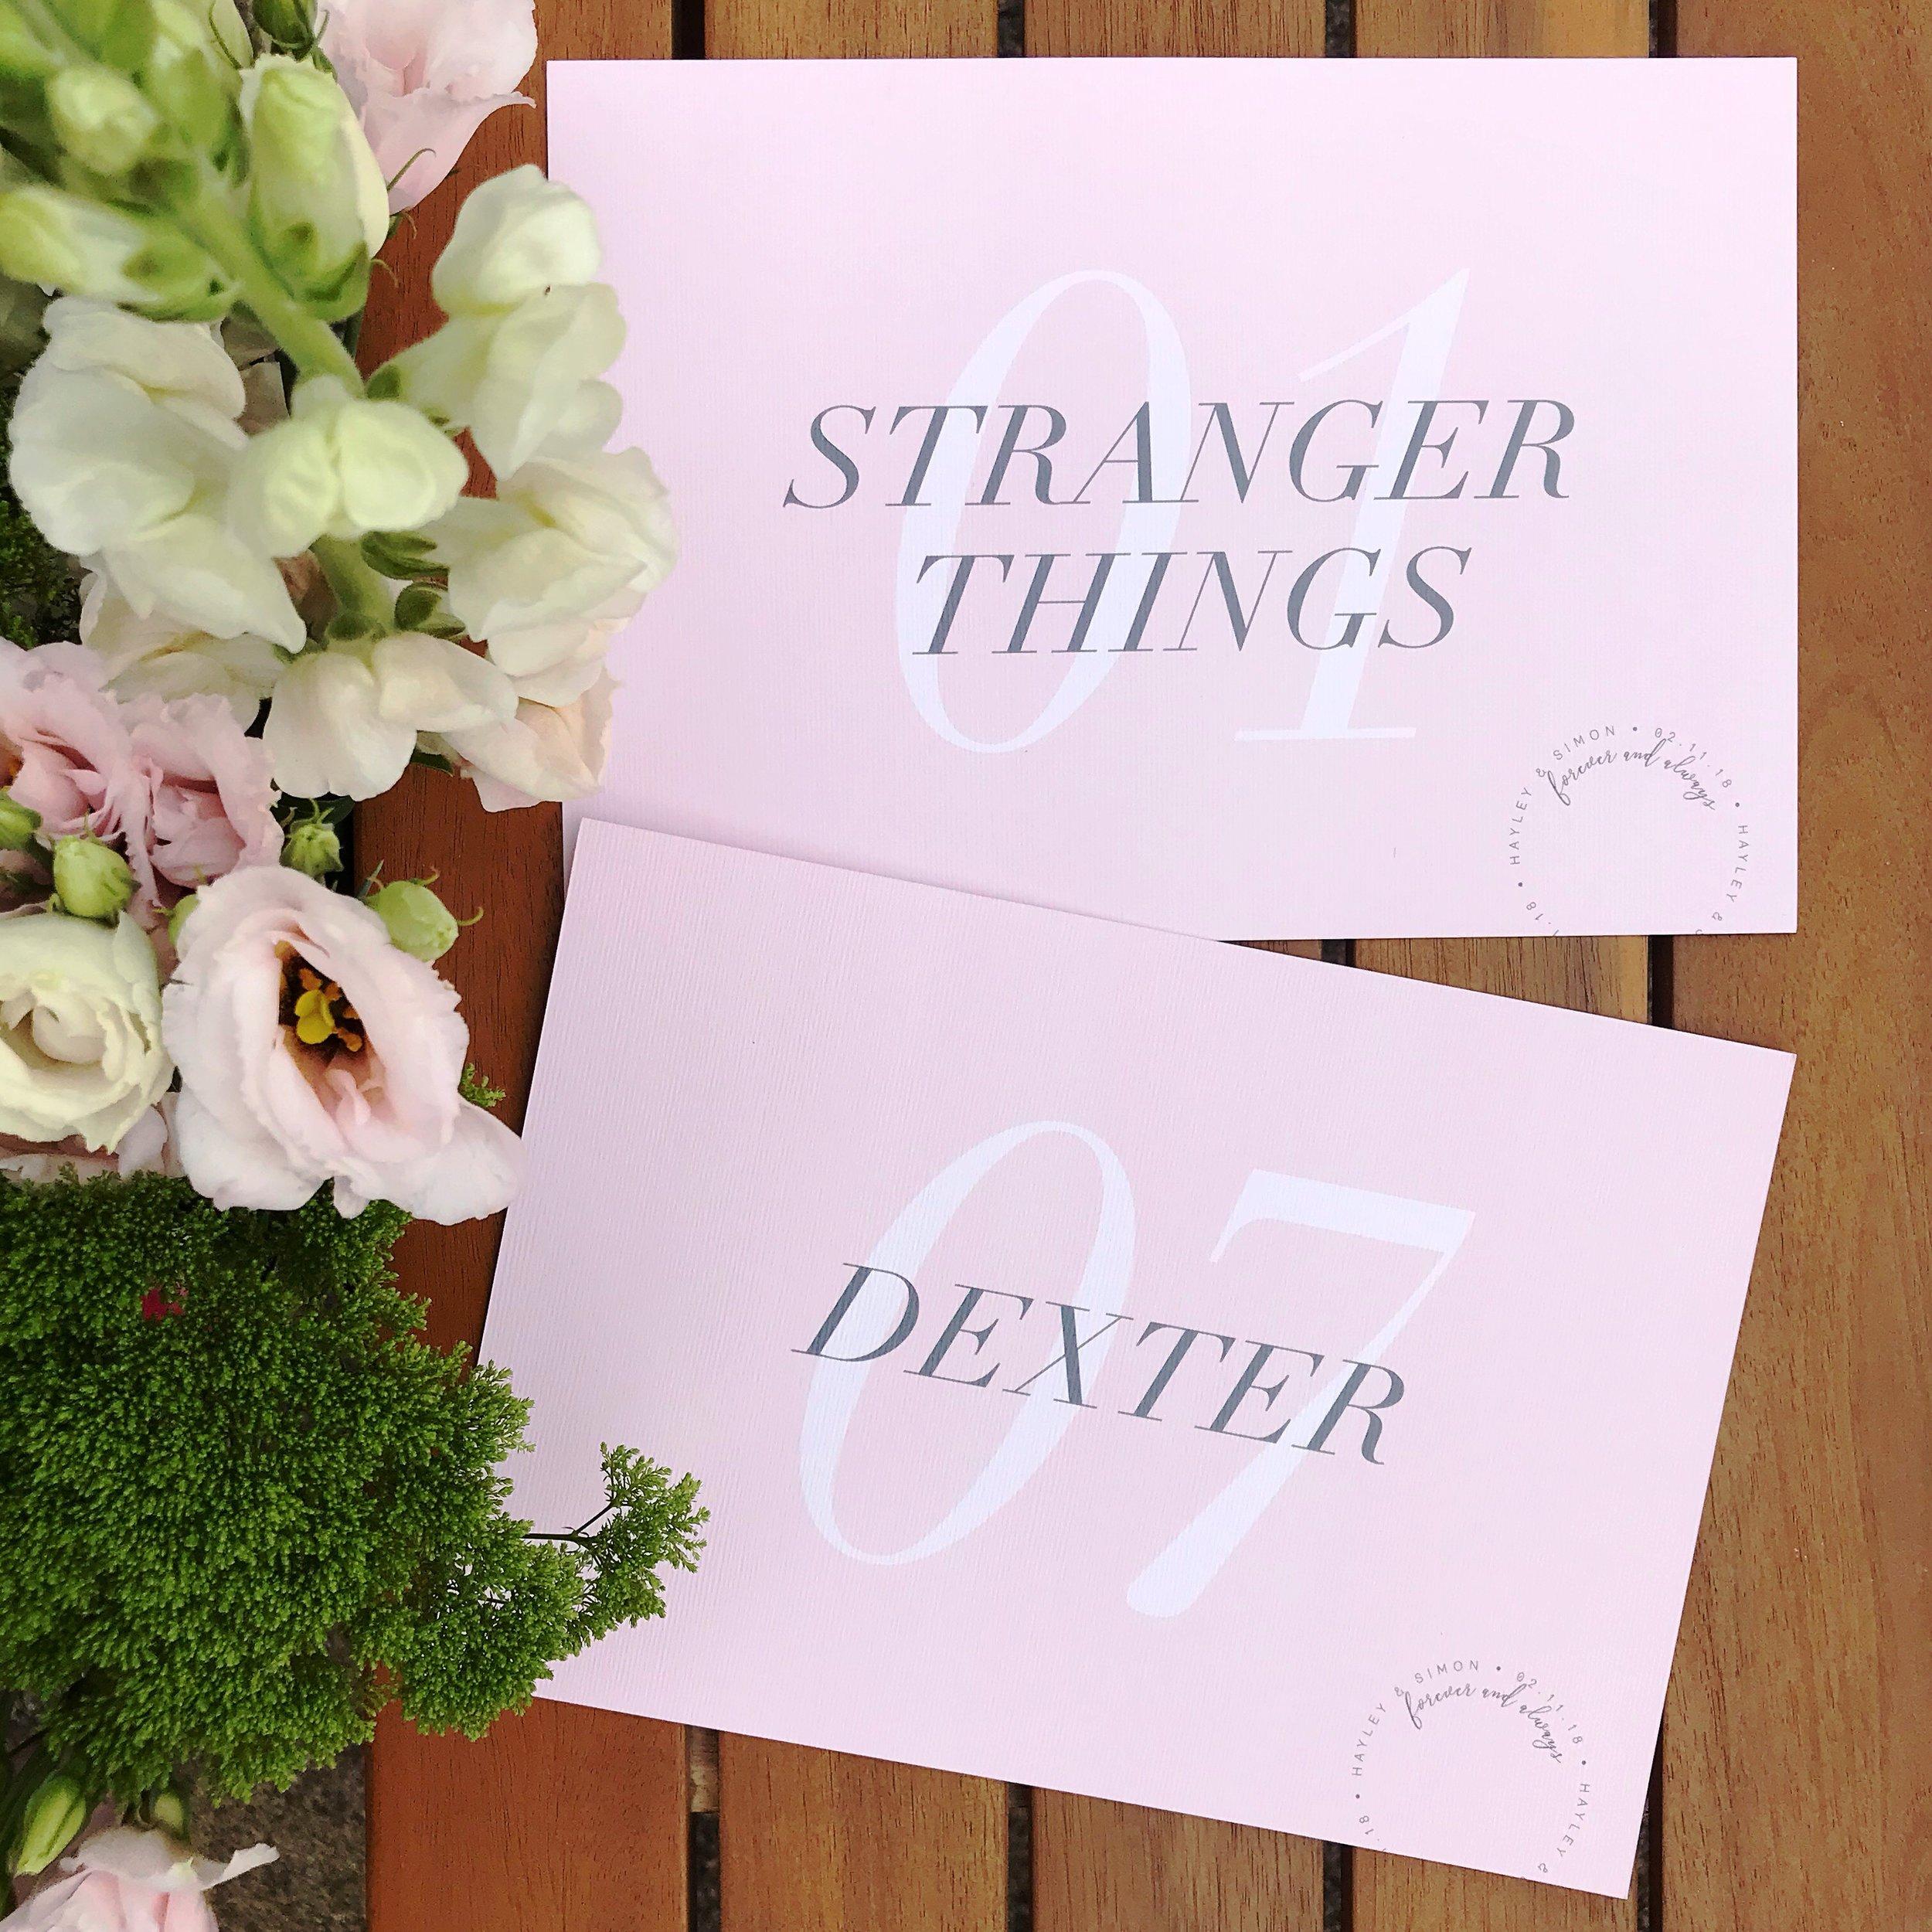 Pastel-pink-wedding-table-names-white-roses-cheltenham-theinkcloset.jpg